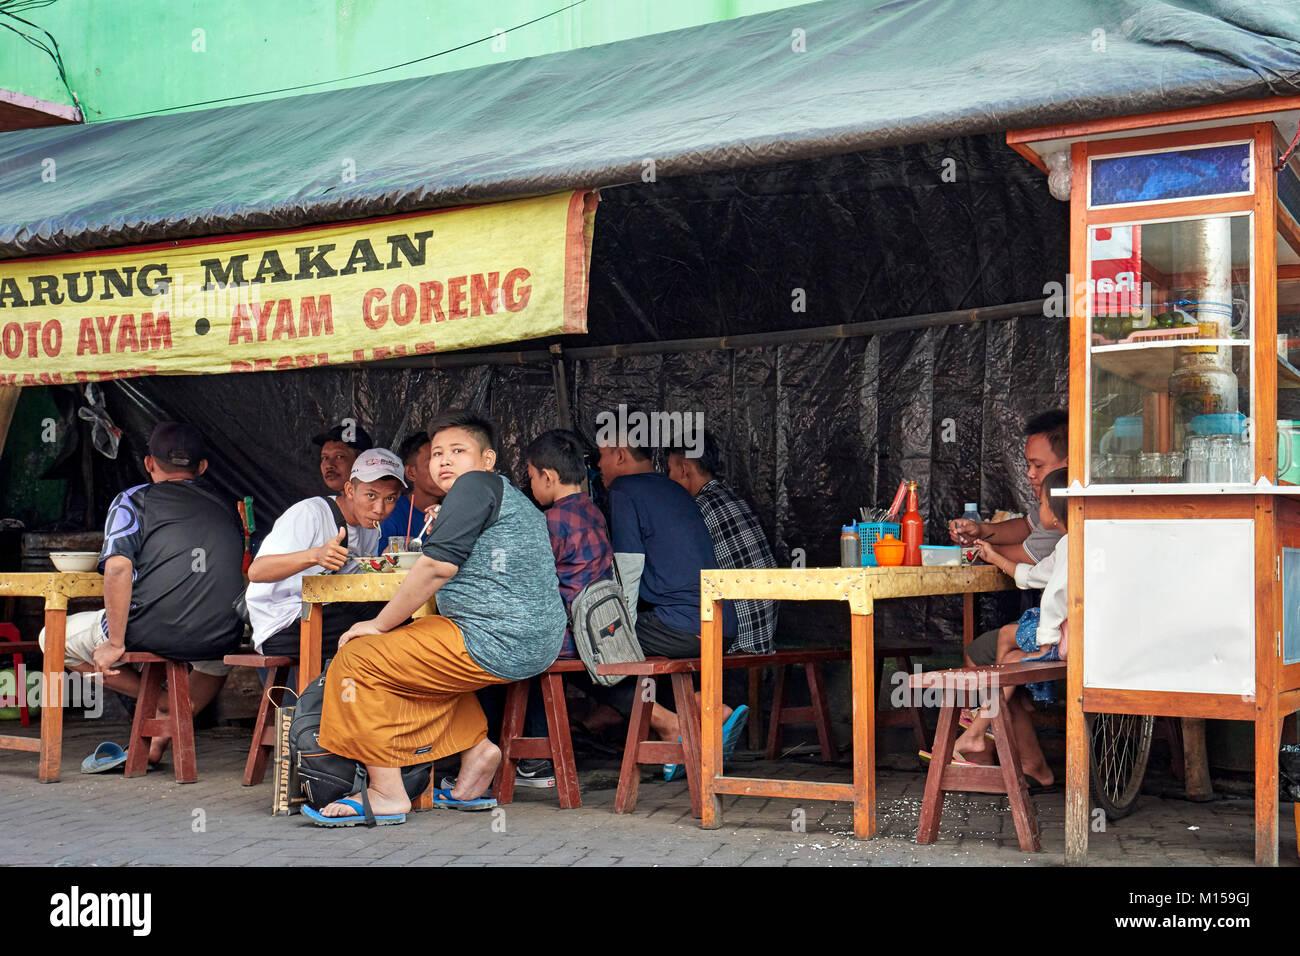 People eating in a small street restaurant on Ketandan Wetan street. Yogyakarta, Java, Indonesia. - Stock Image